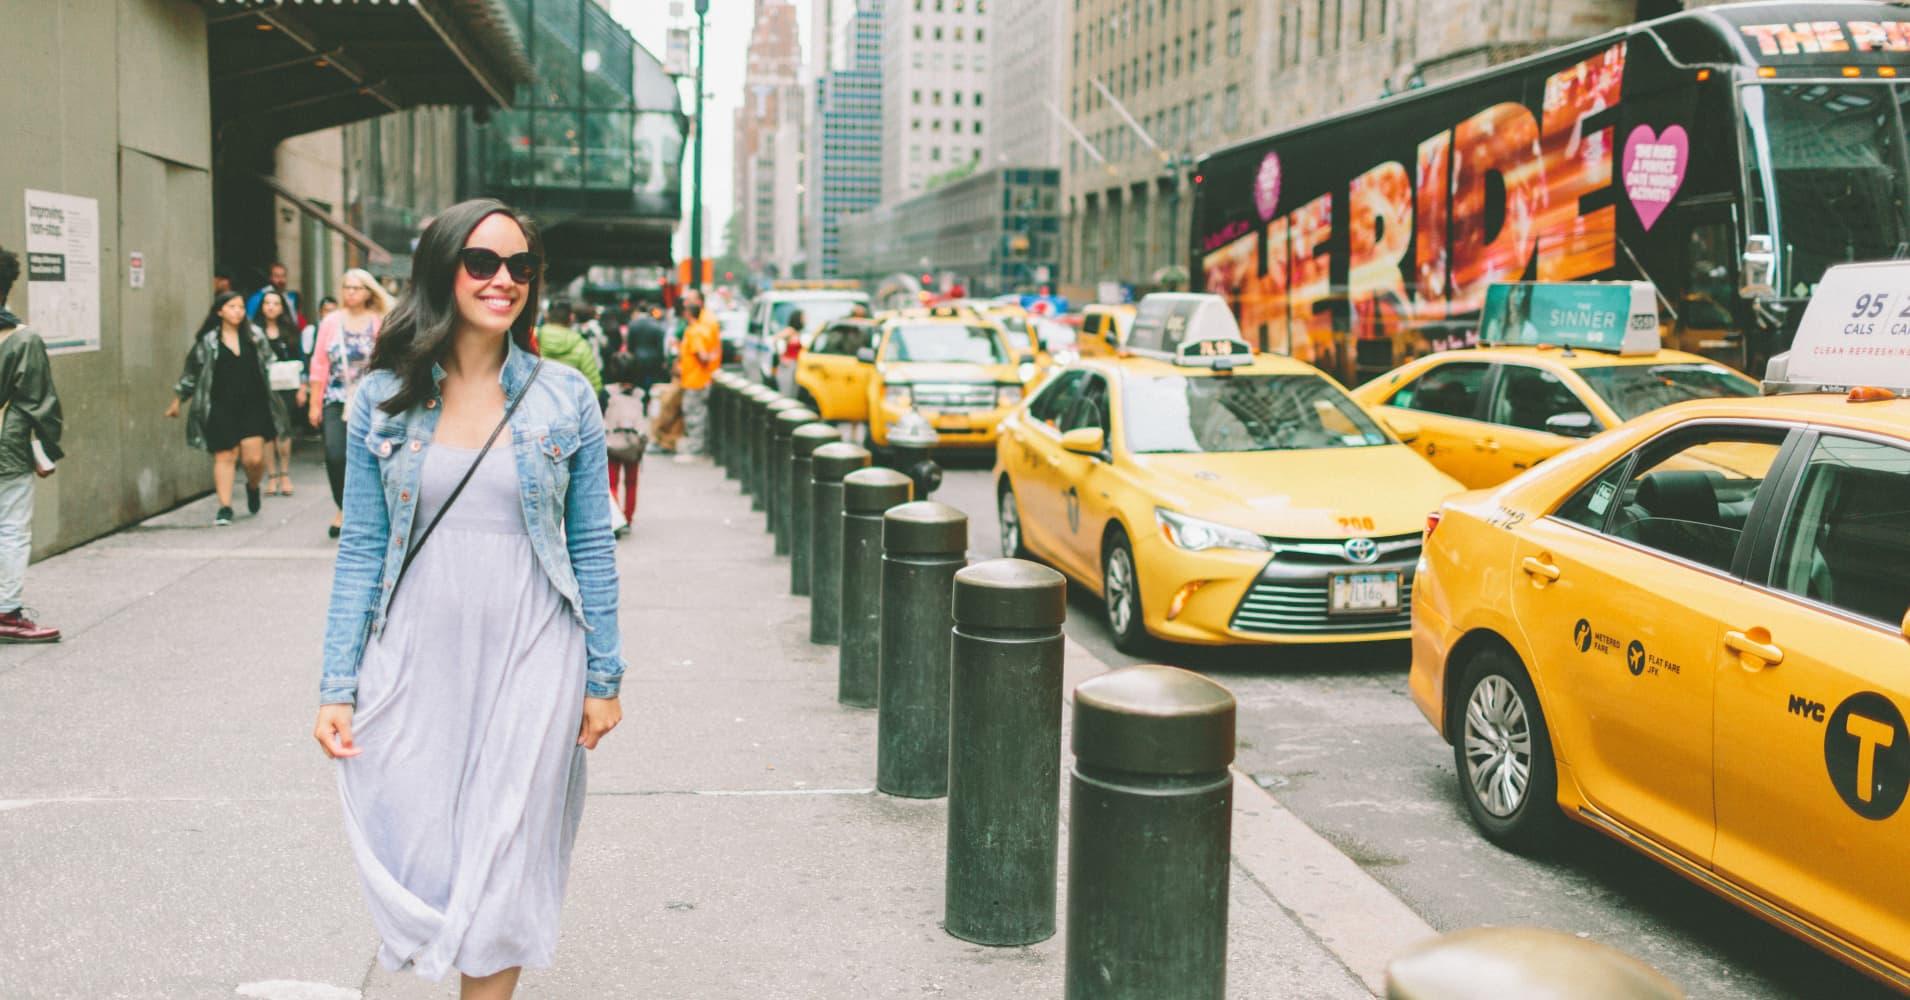 Woman walking in New York City